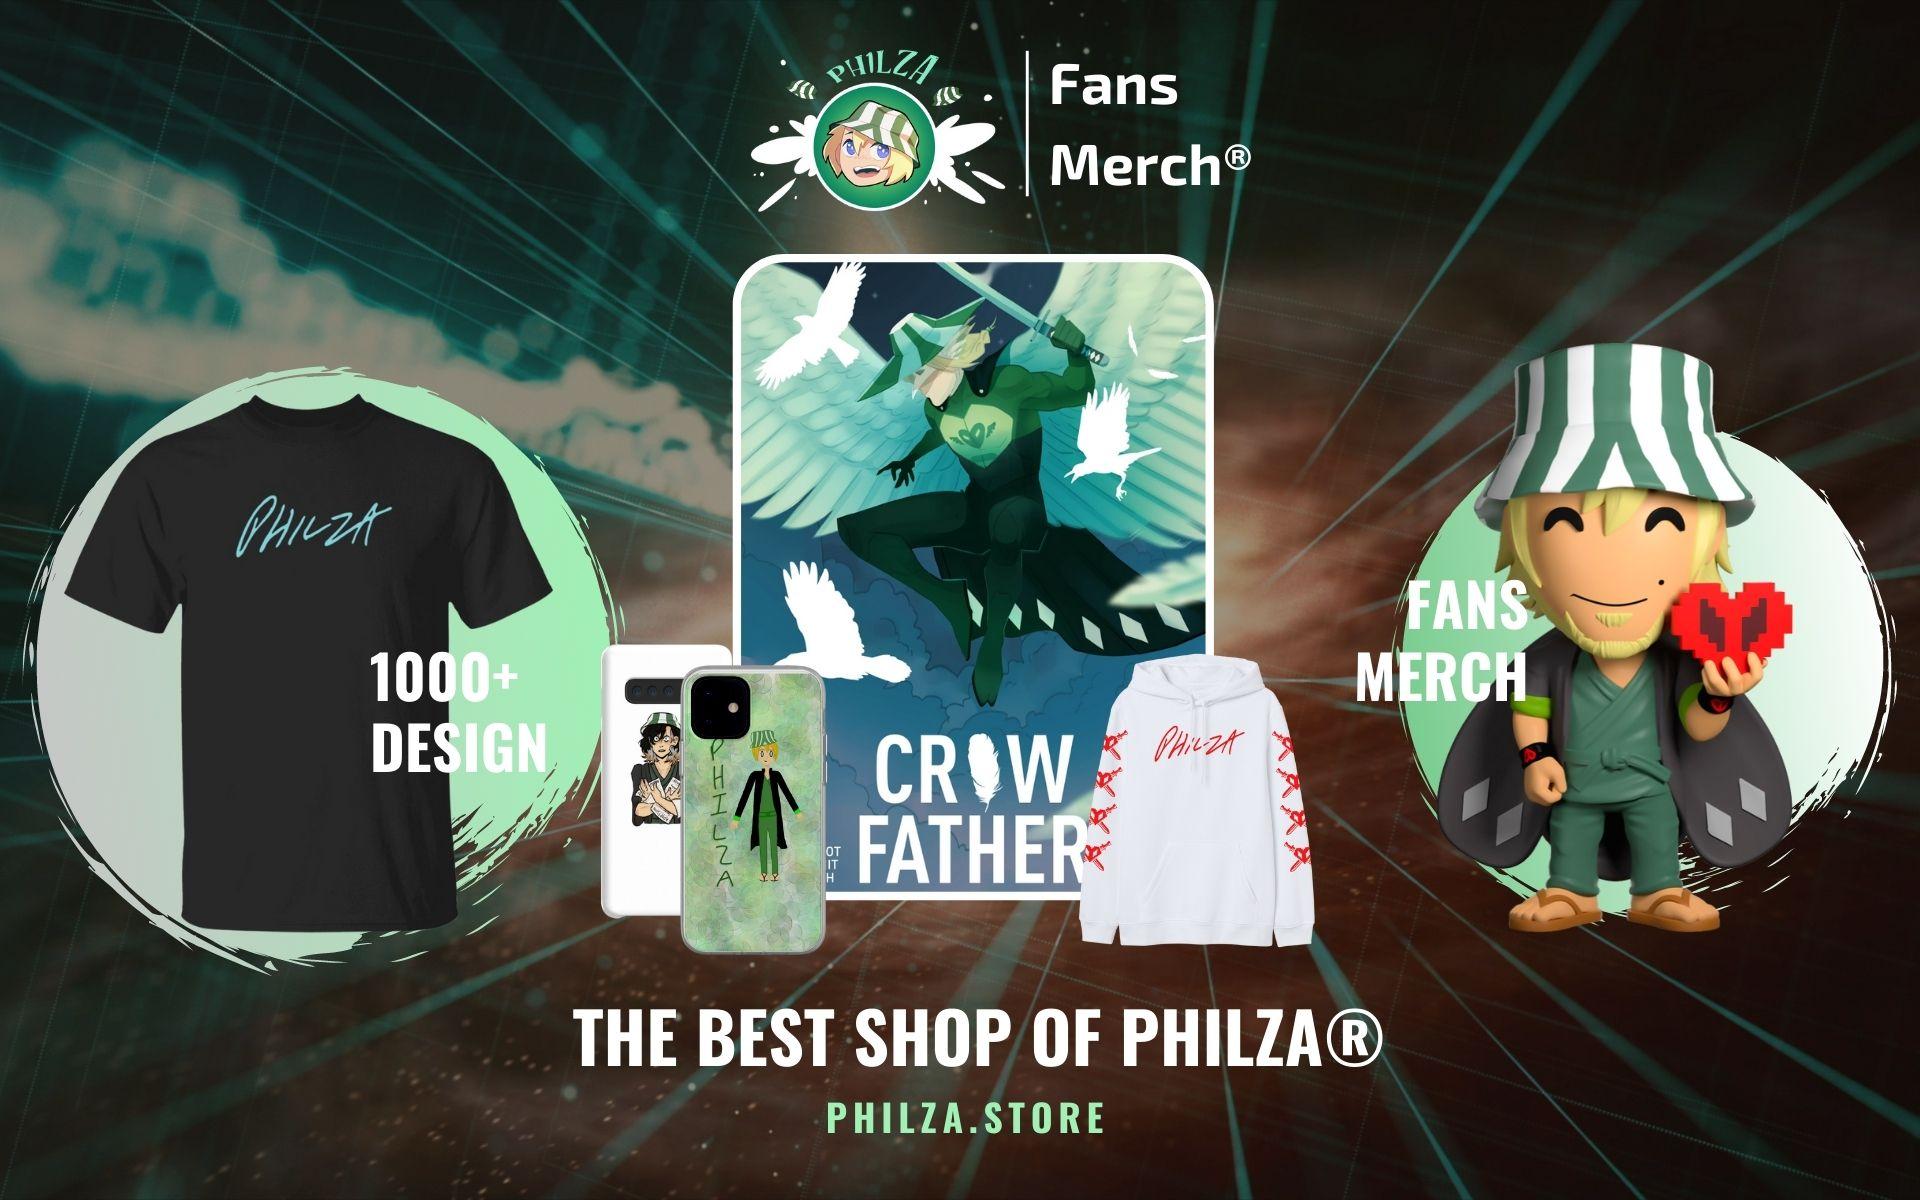 Philza Merch Web Banner - Philza Merch